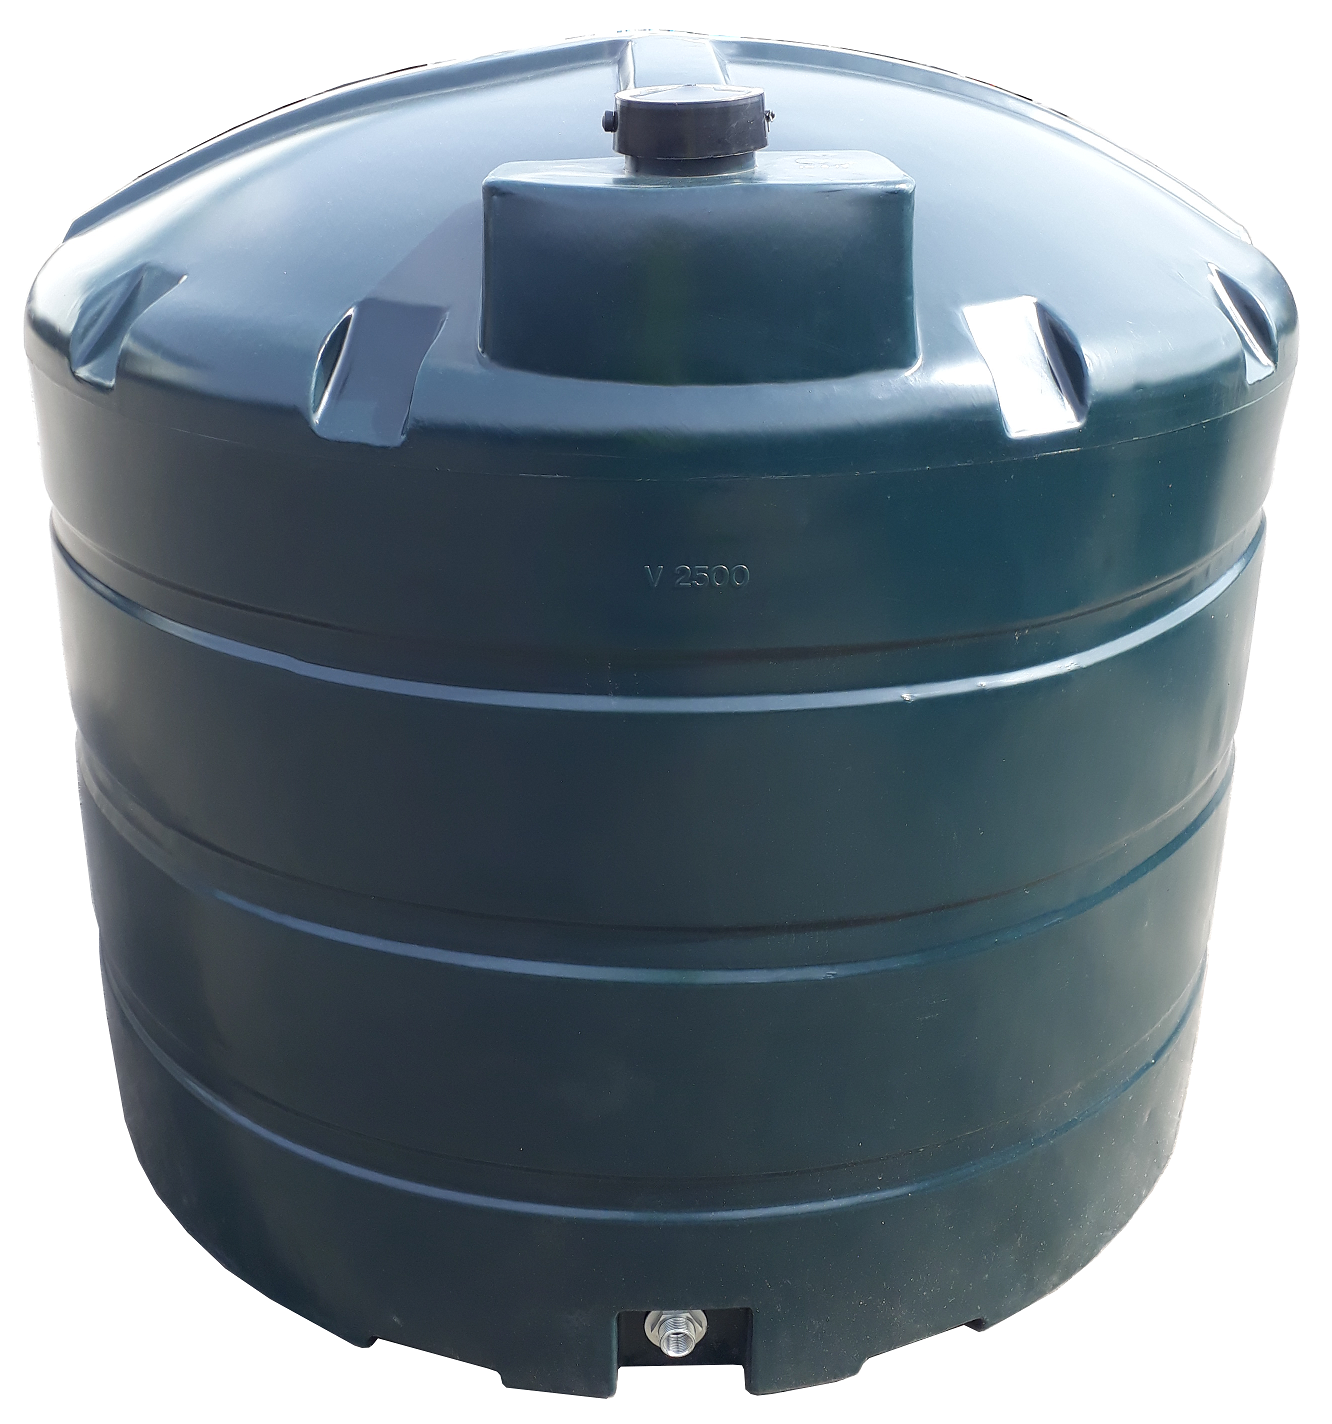 2500 Litre Vertical Oil Tank Image